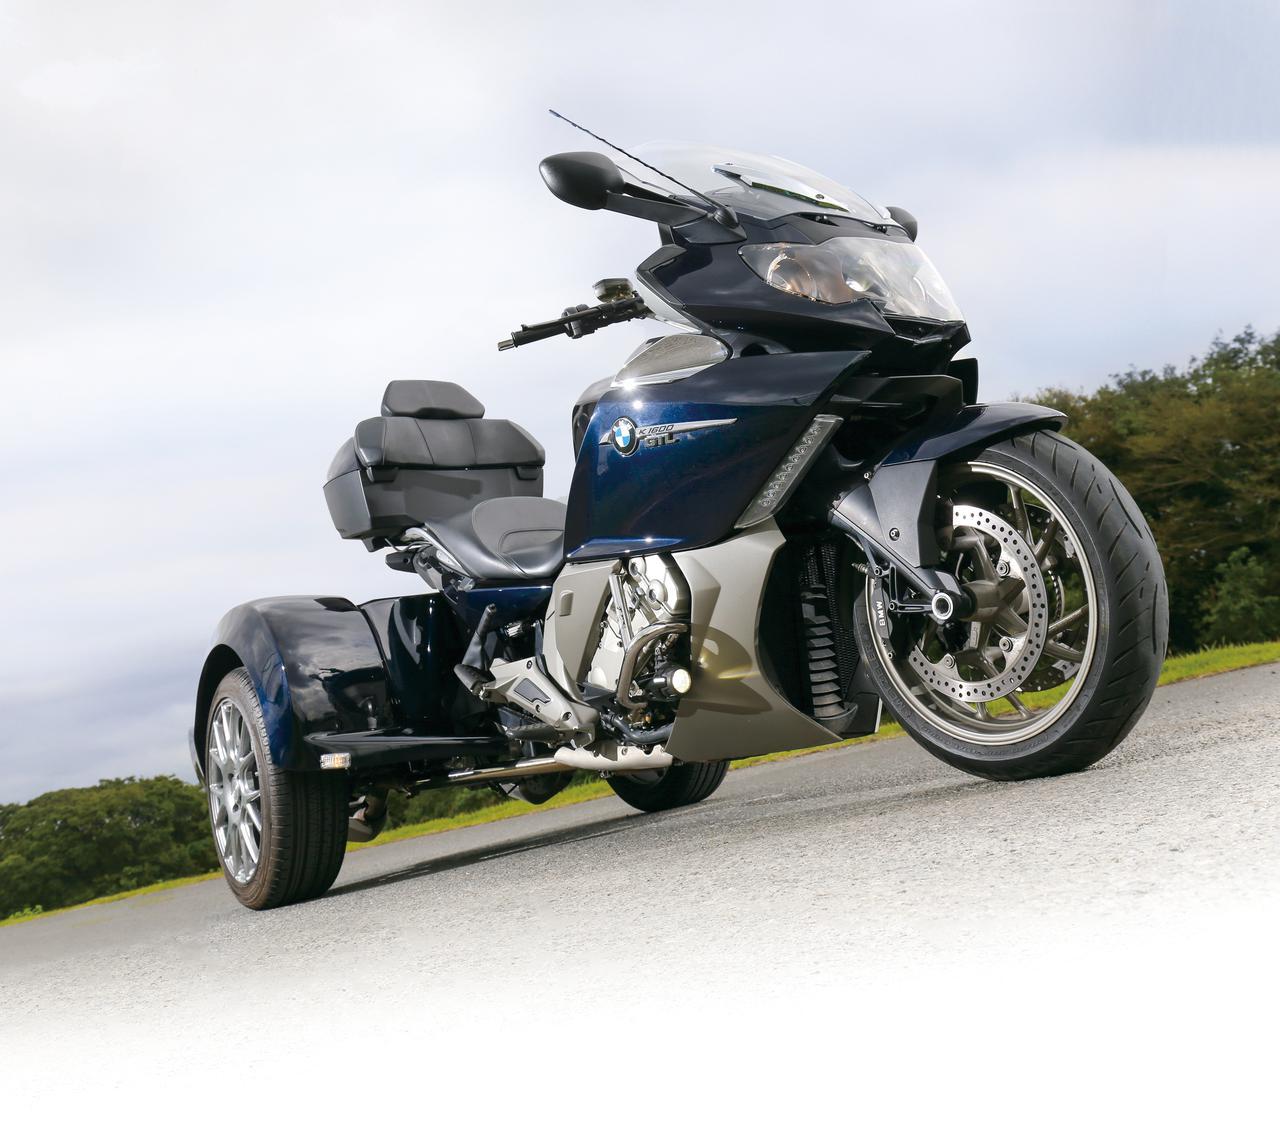 Images : 1番目の画像 - K1600GTL TRIKEの写真をまとめて見る! - webオートバイ